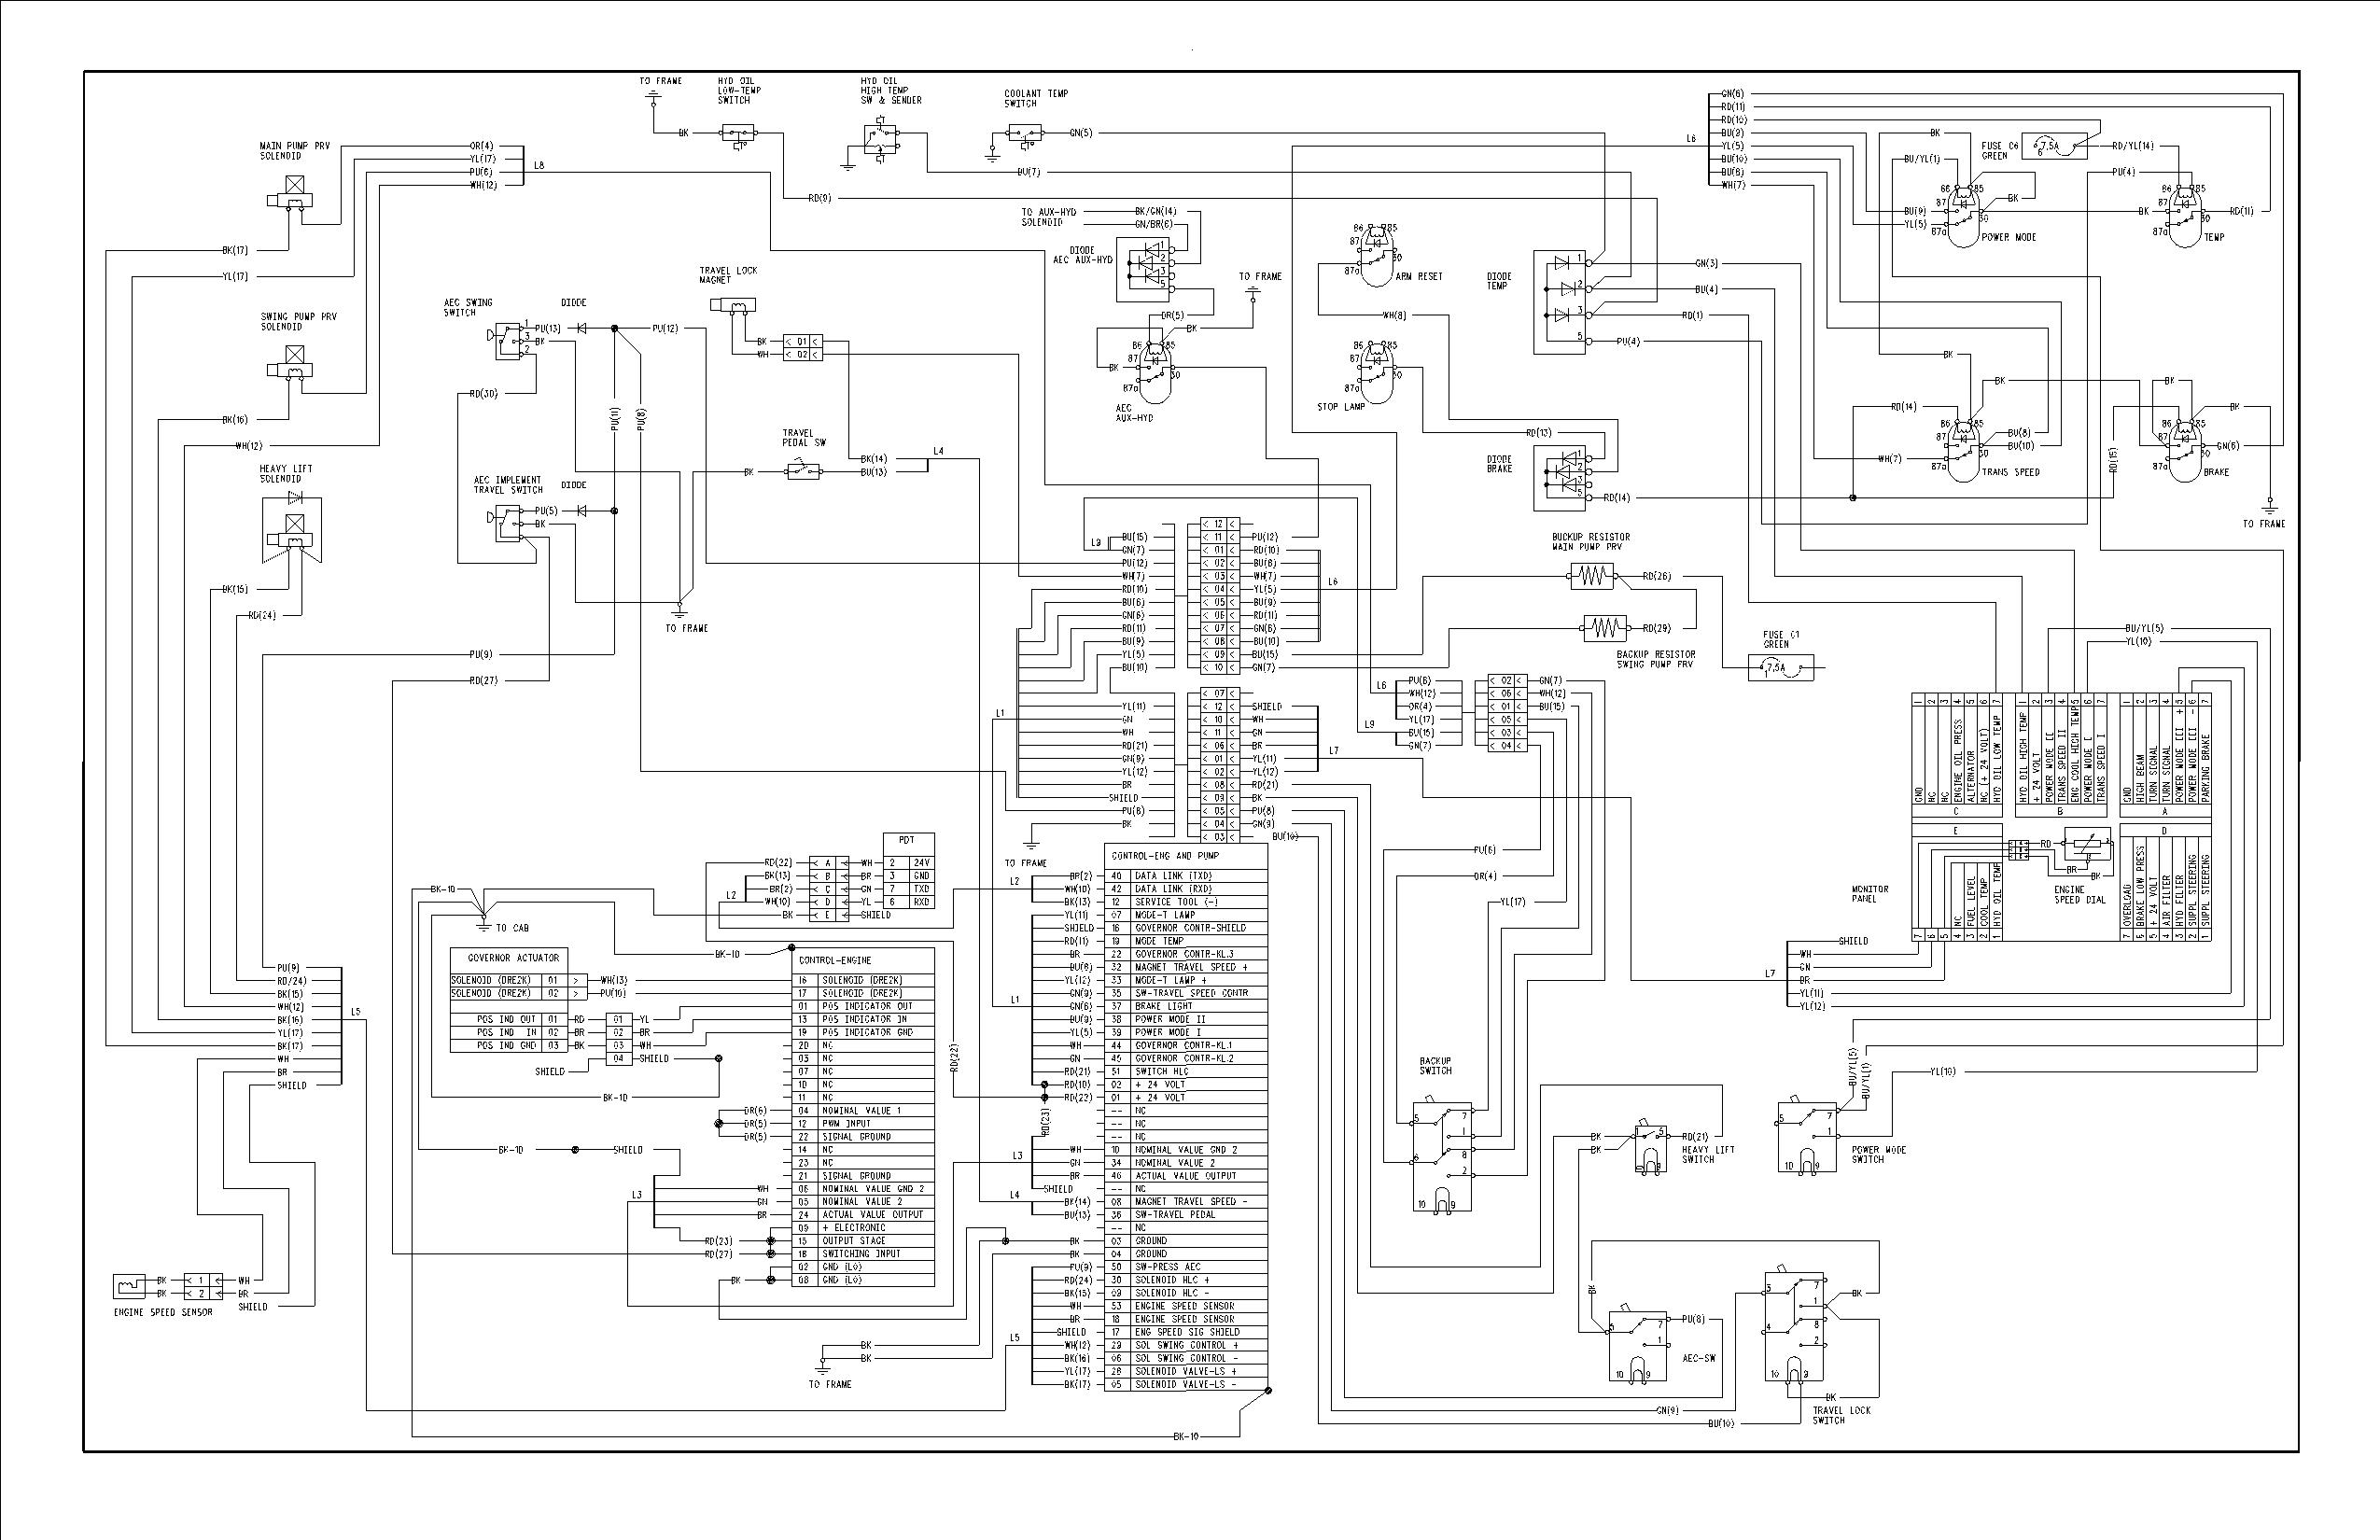 d88ad3ec-a232-4165-b3ea-d4e2287c2fbd_M318 system schematic..png